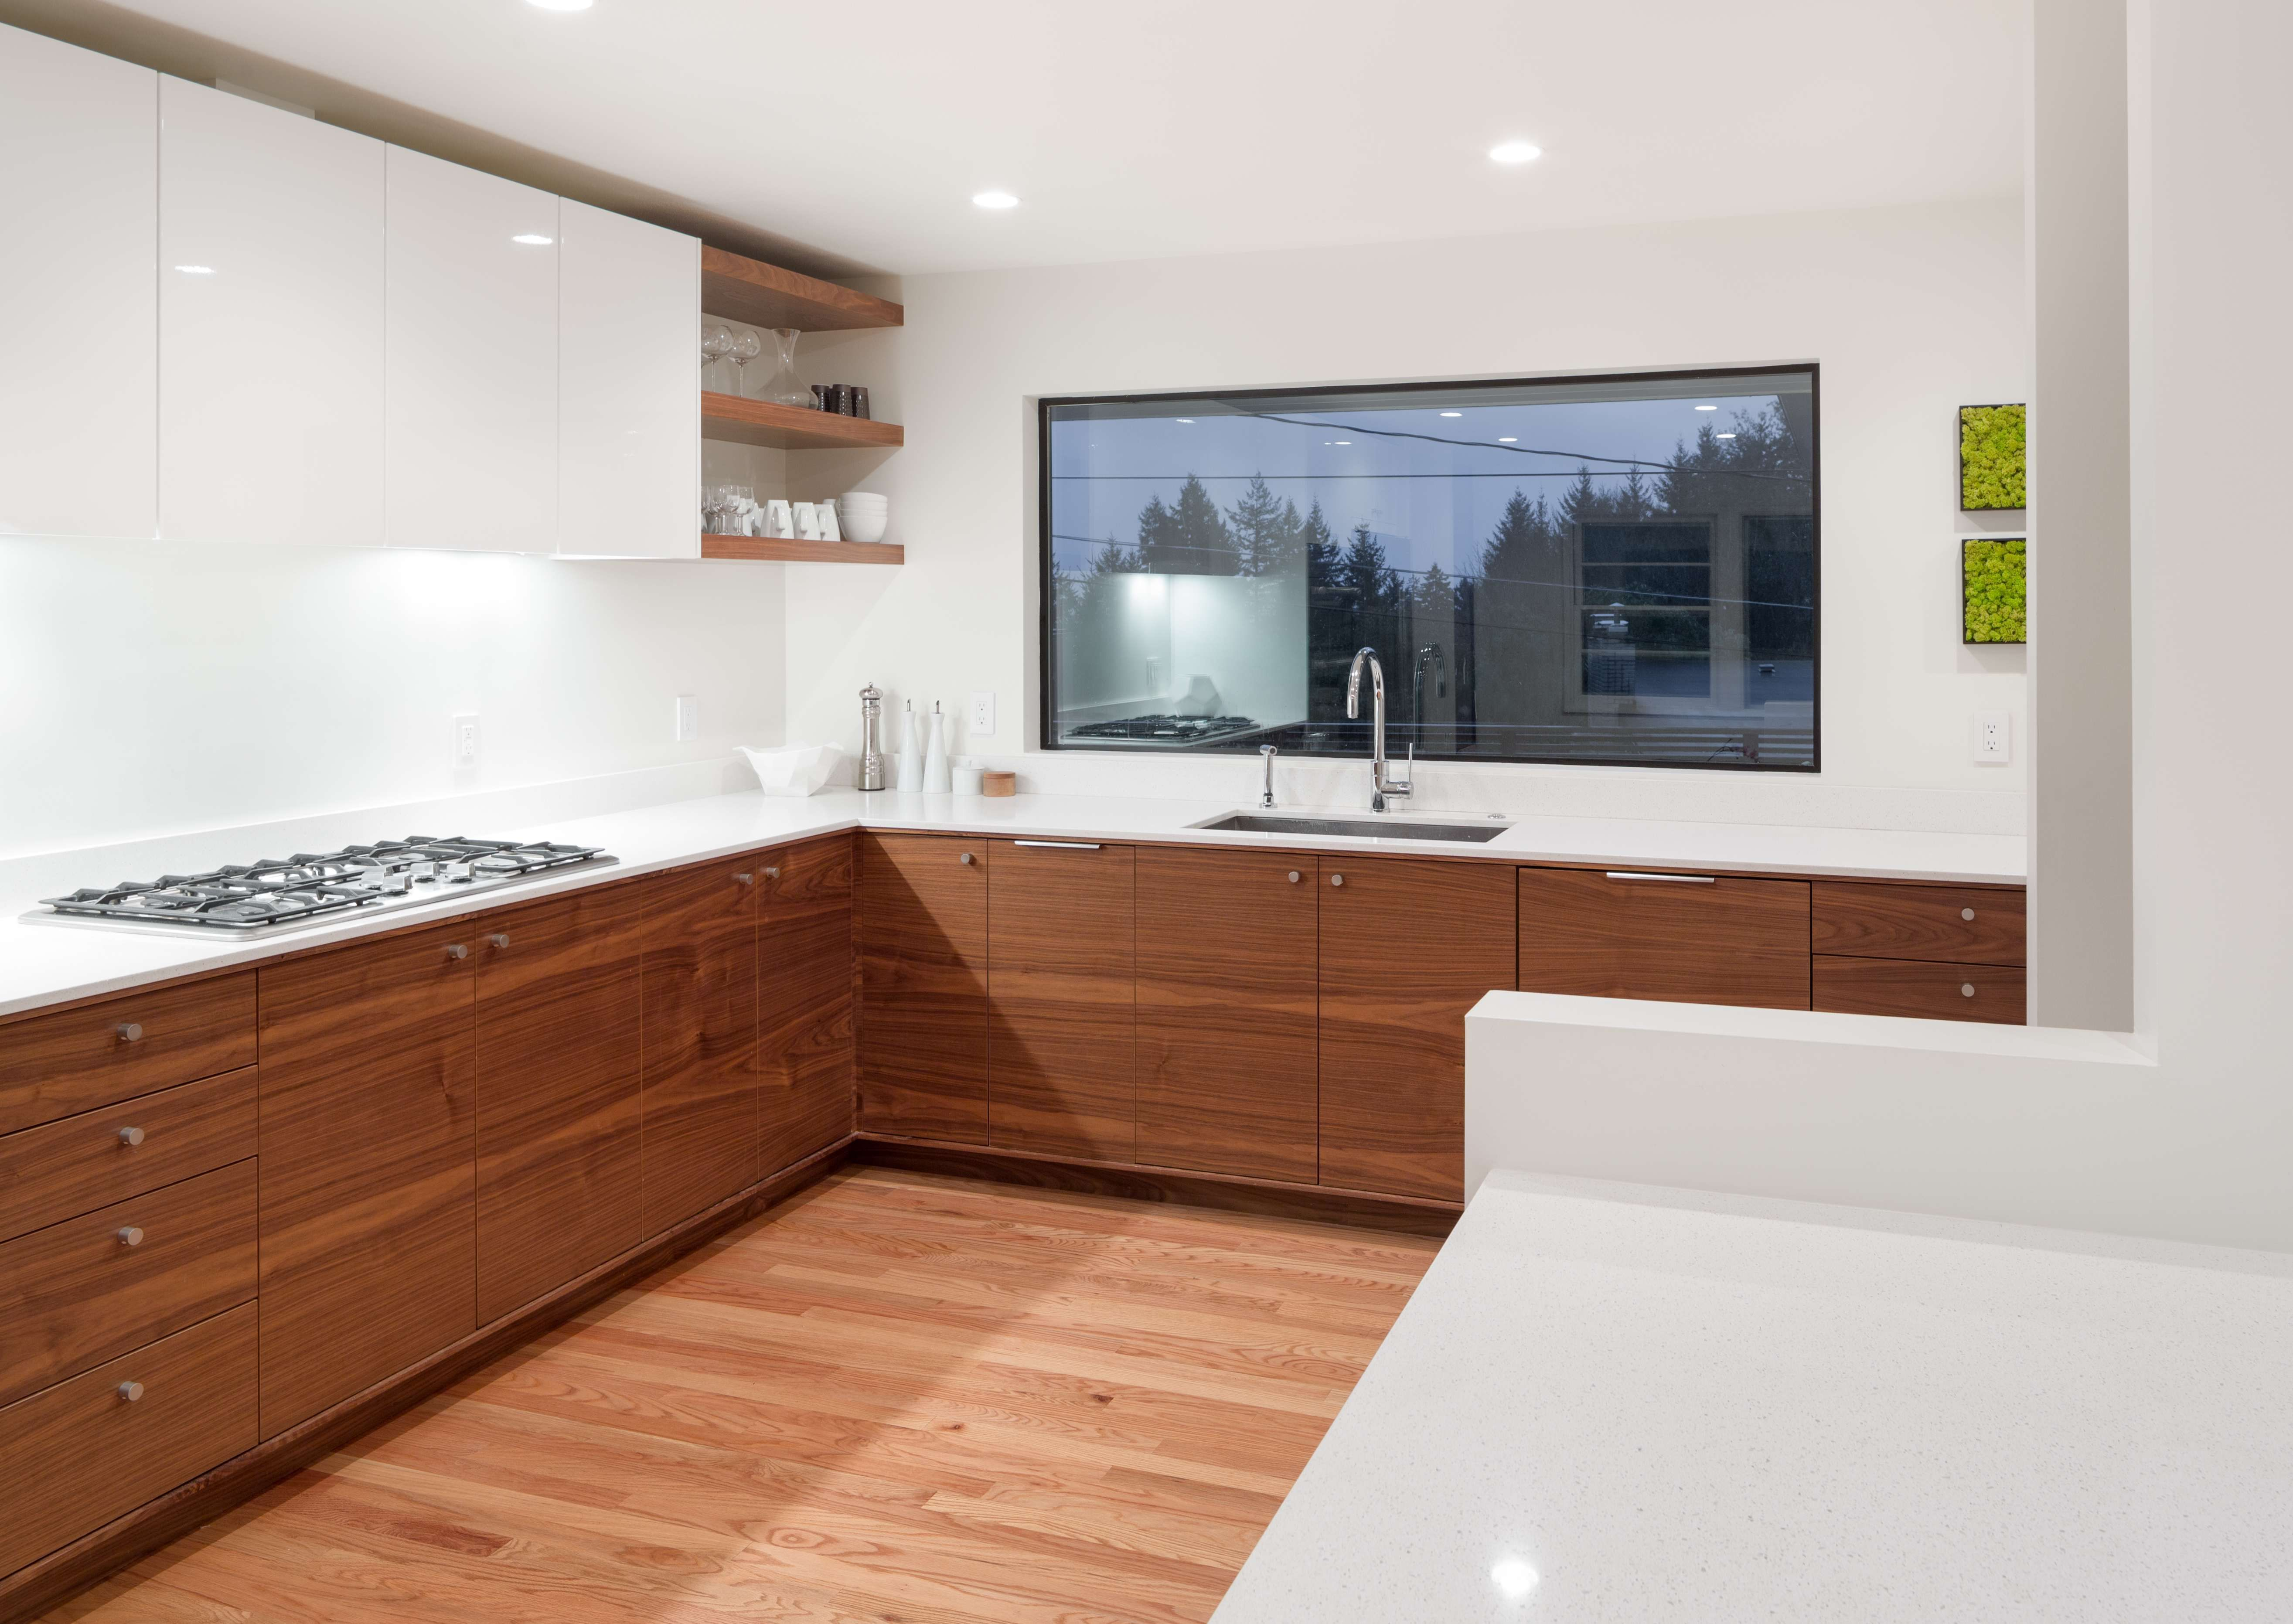 High Gloss White + Grain Matched Walnut Cabinets. White